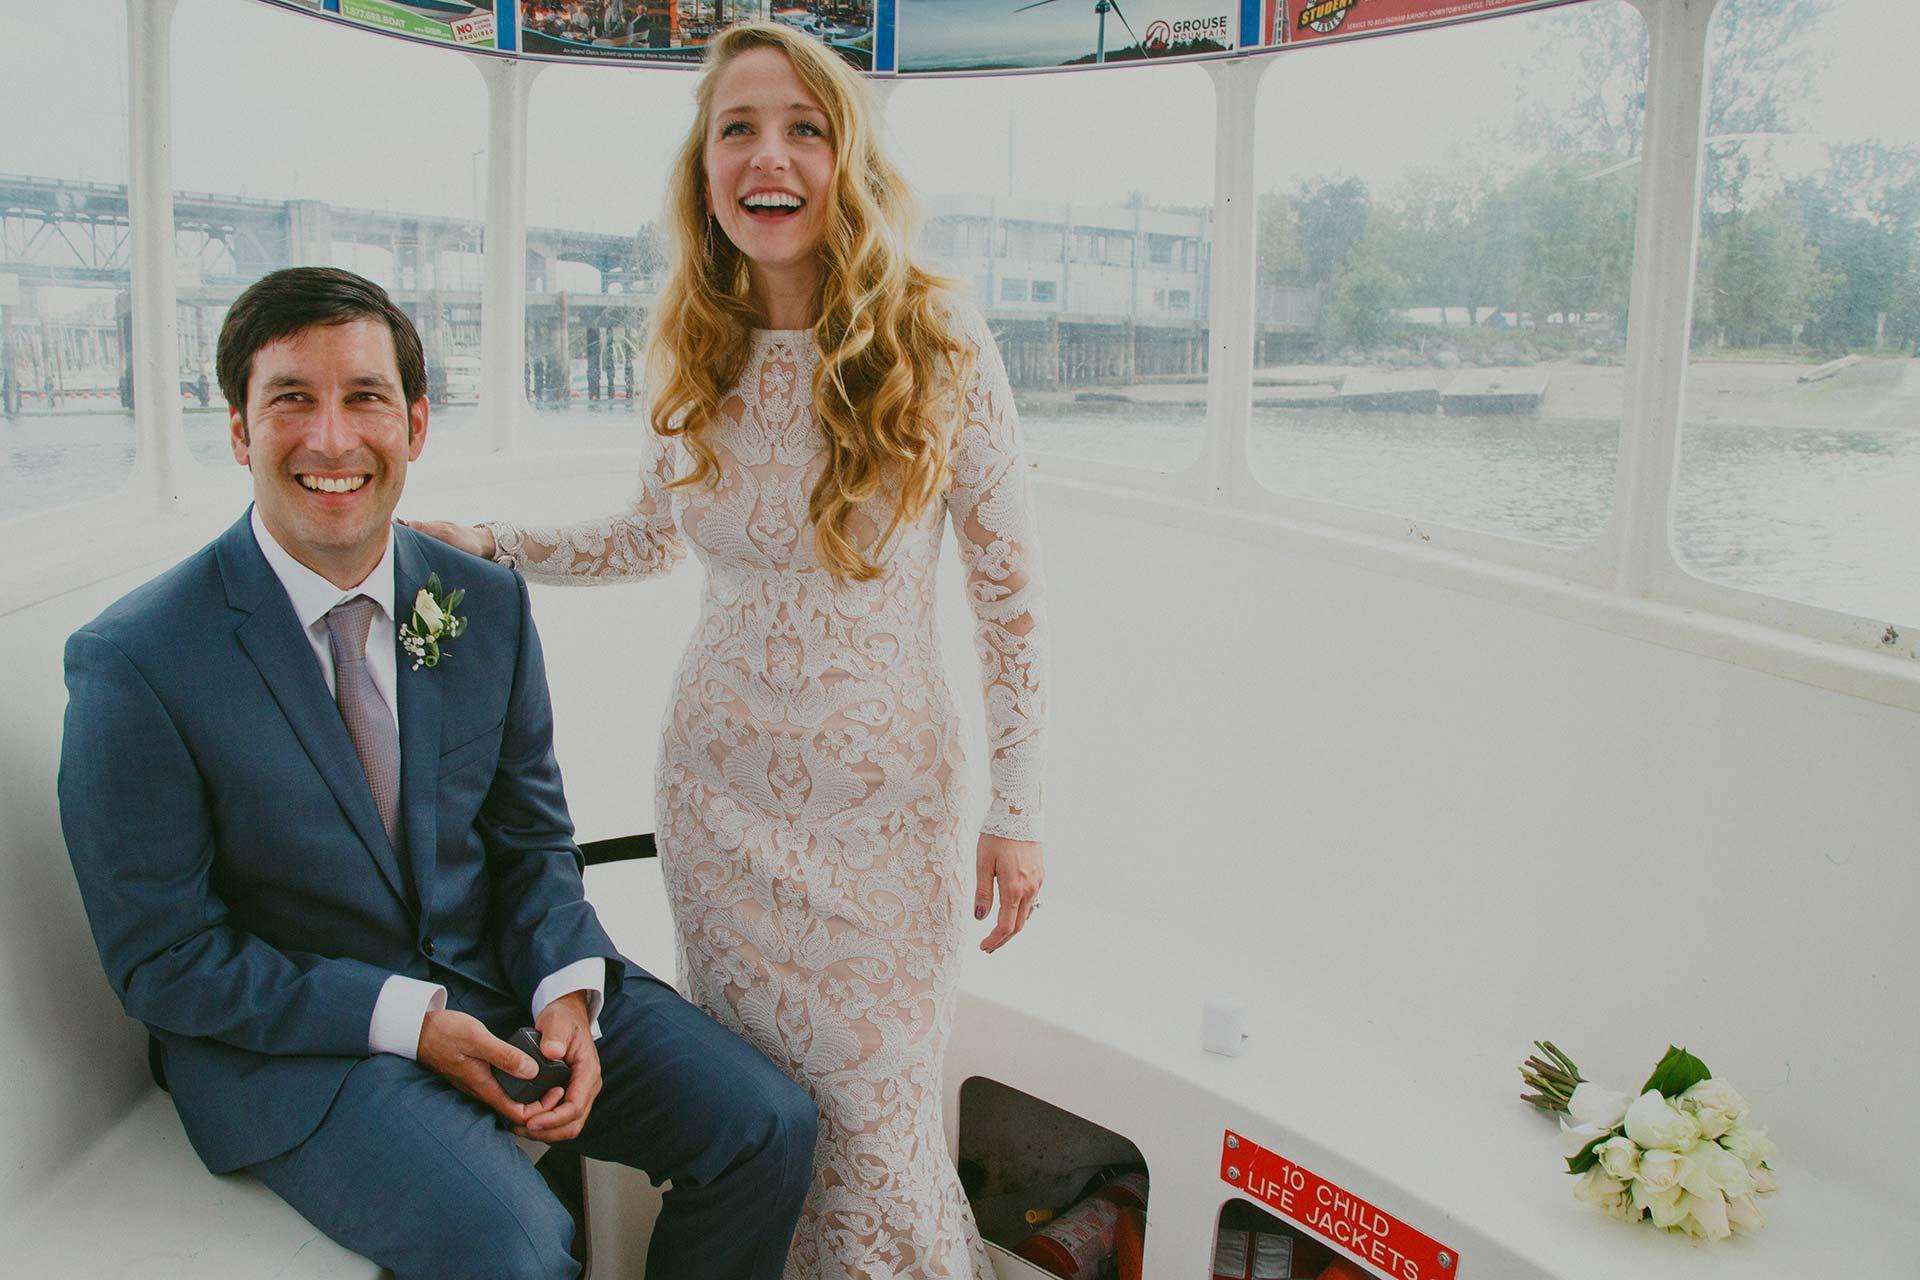 Vancouver Aquabus wedding